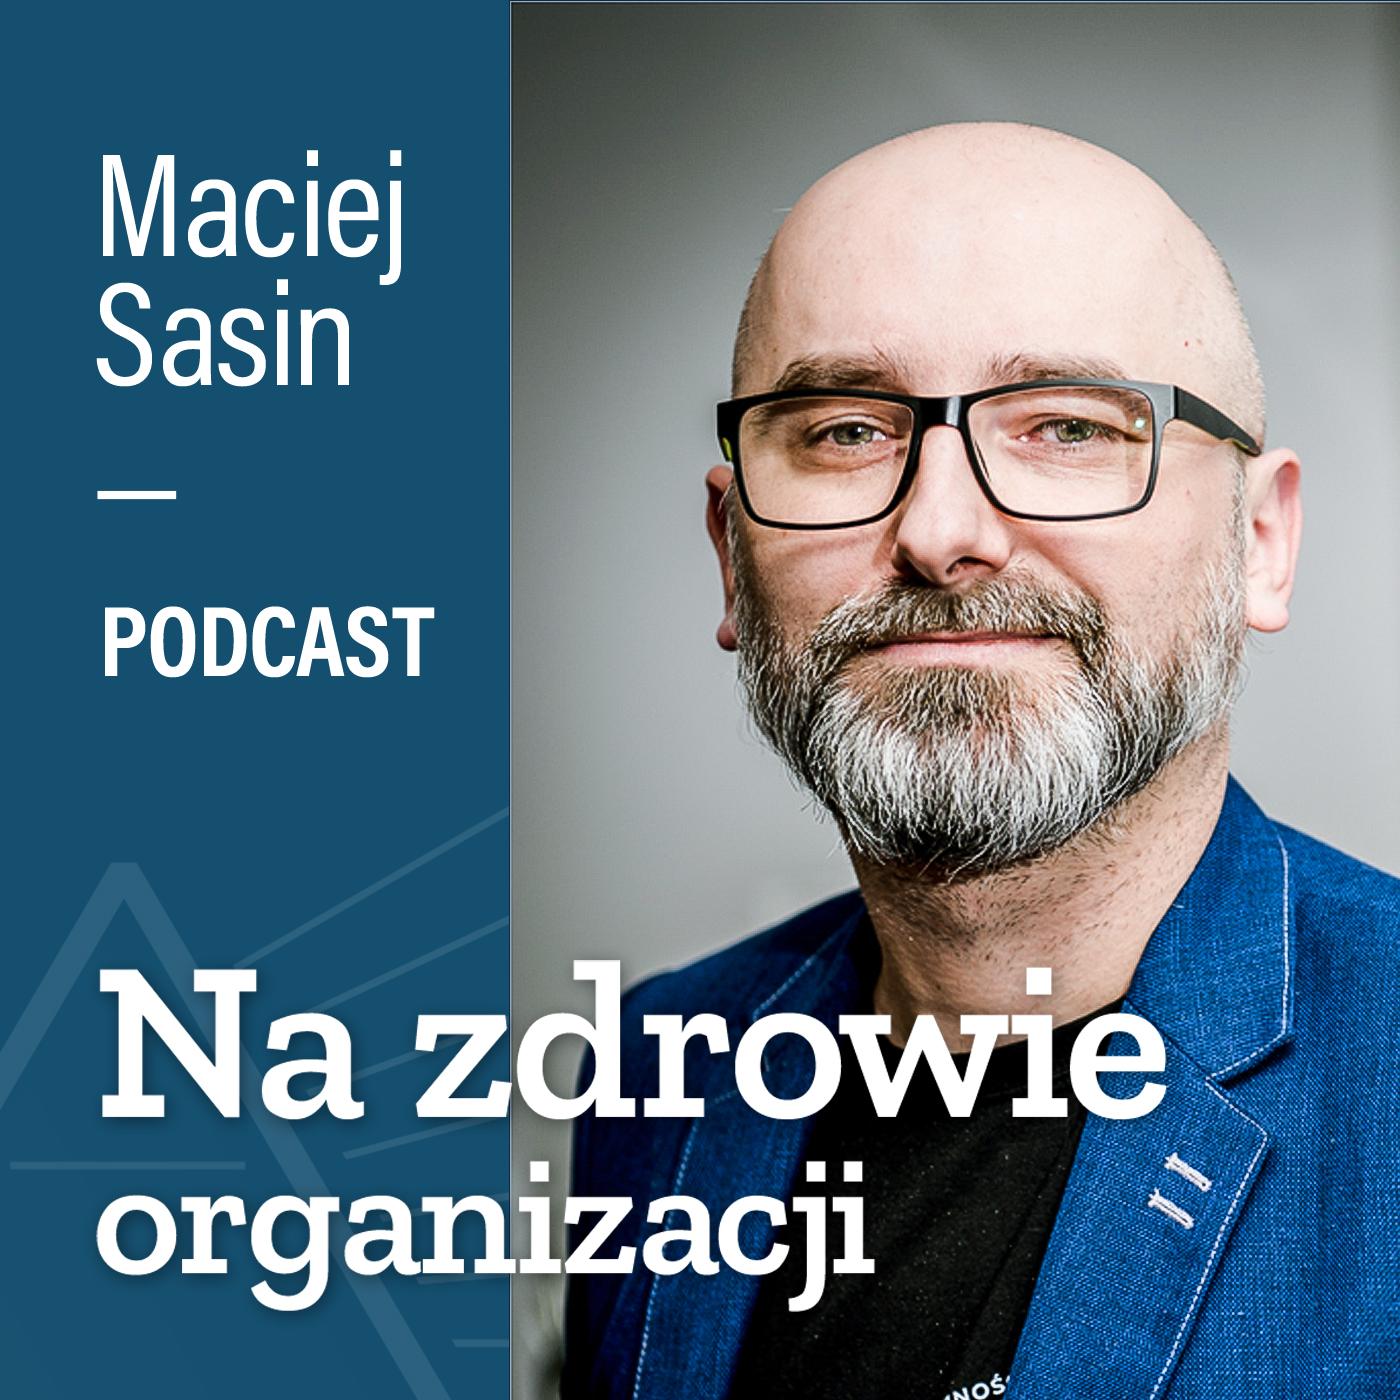 Maciej Sasin